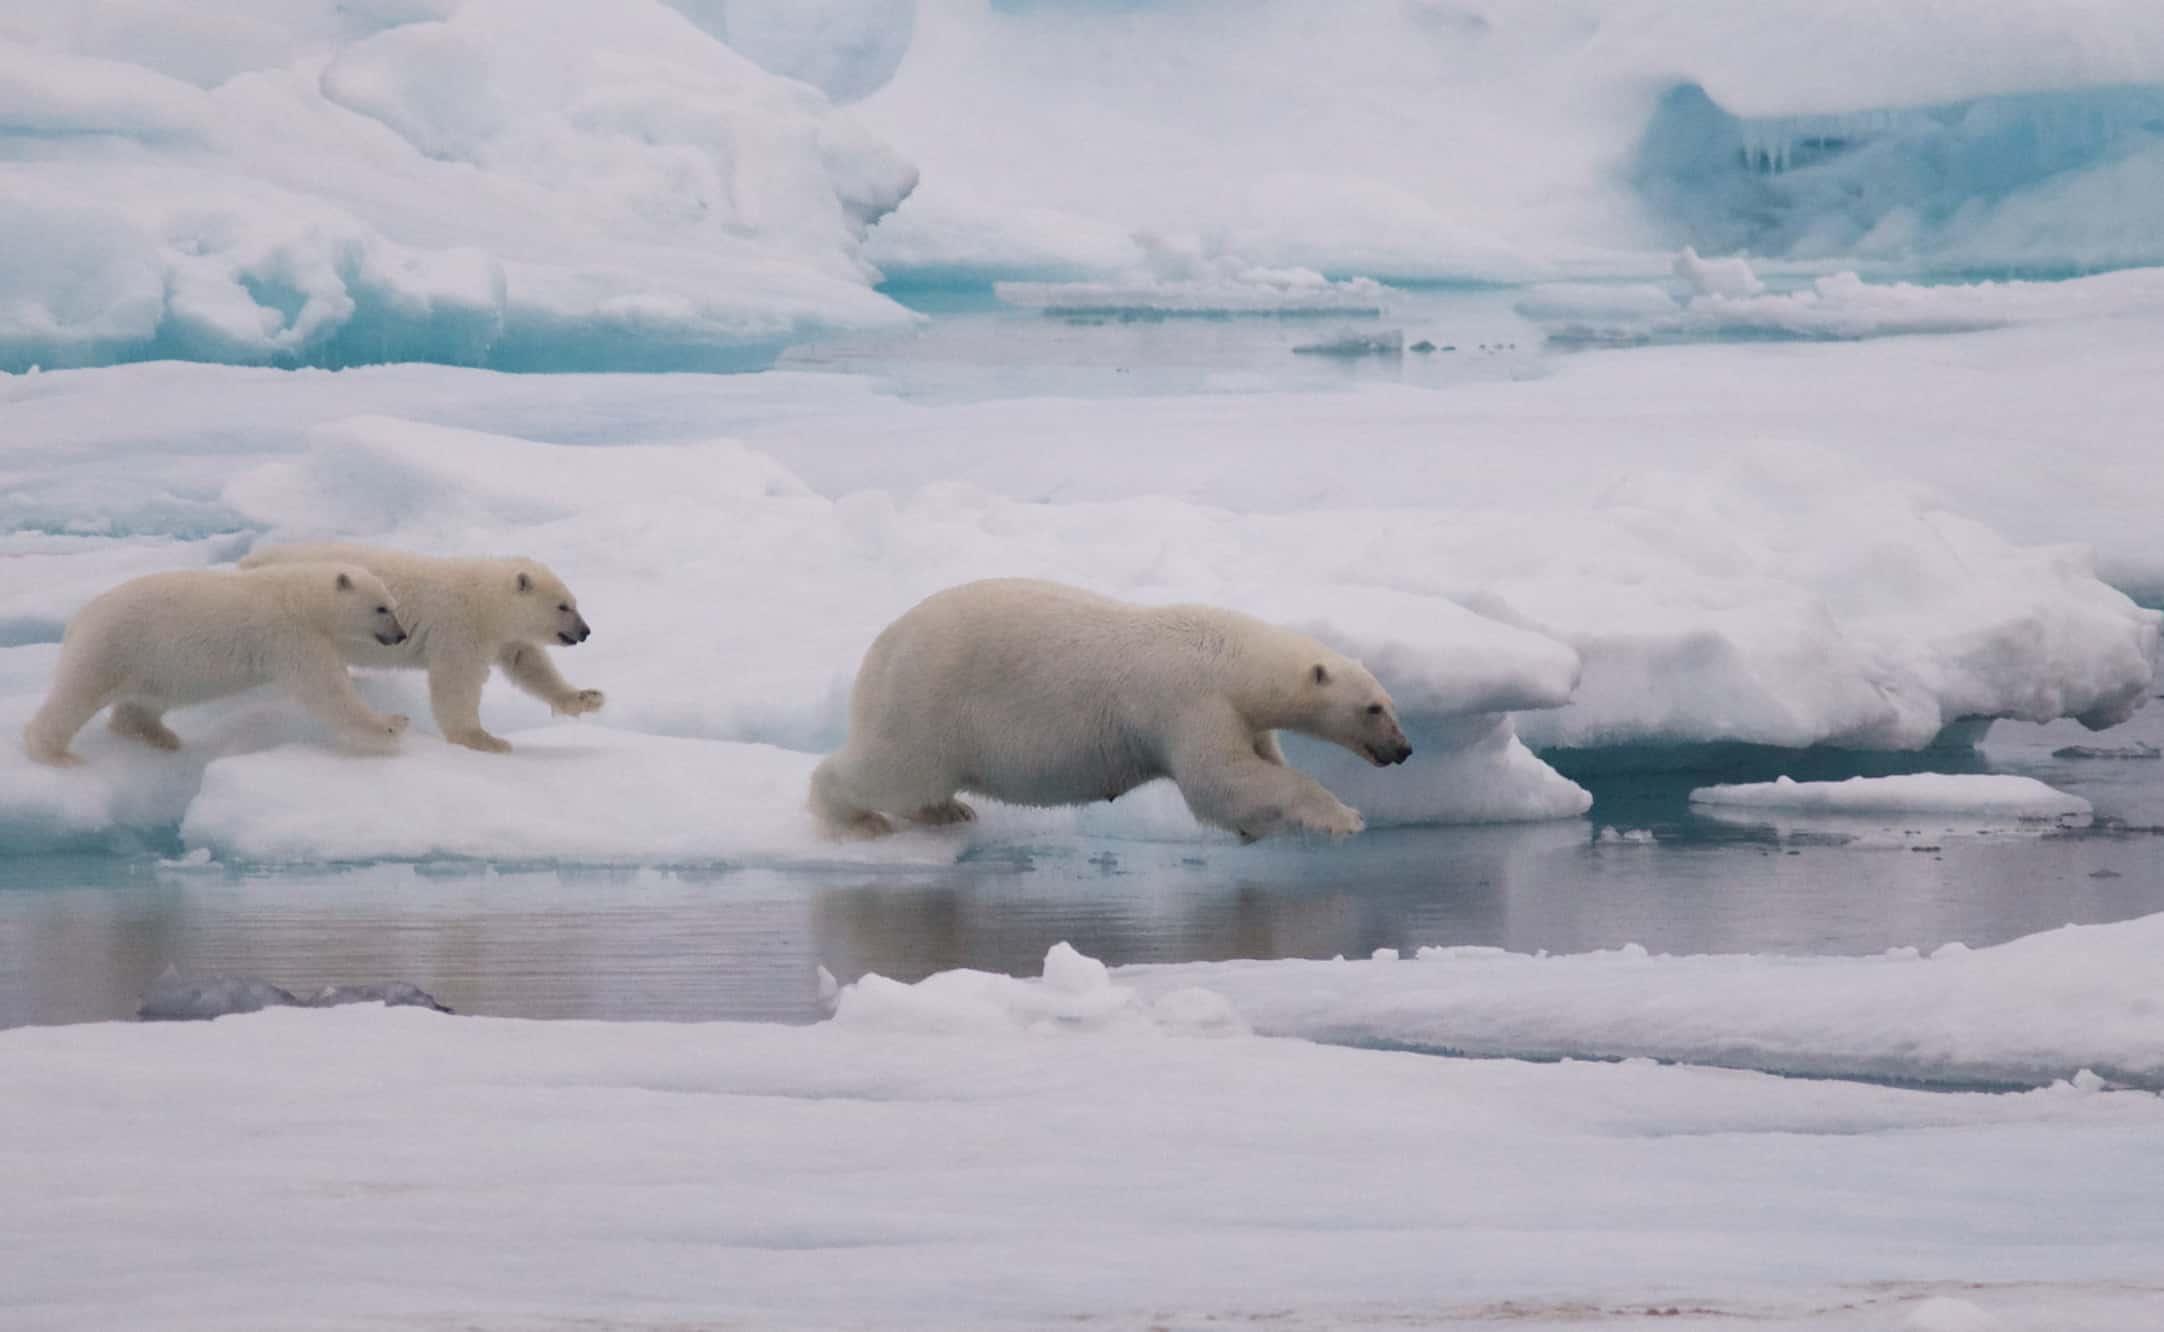 Iceland, Greenland & Svalbard!